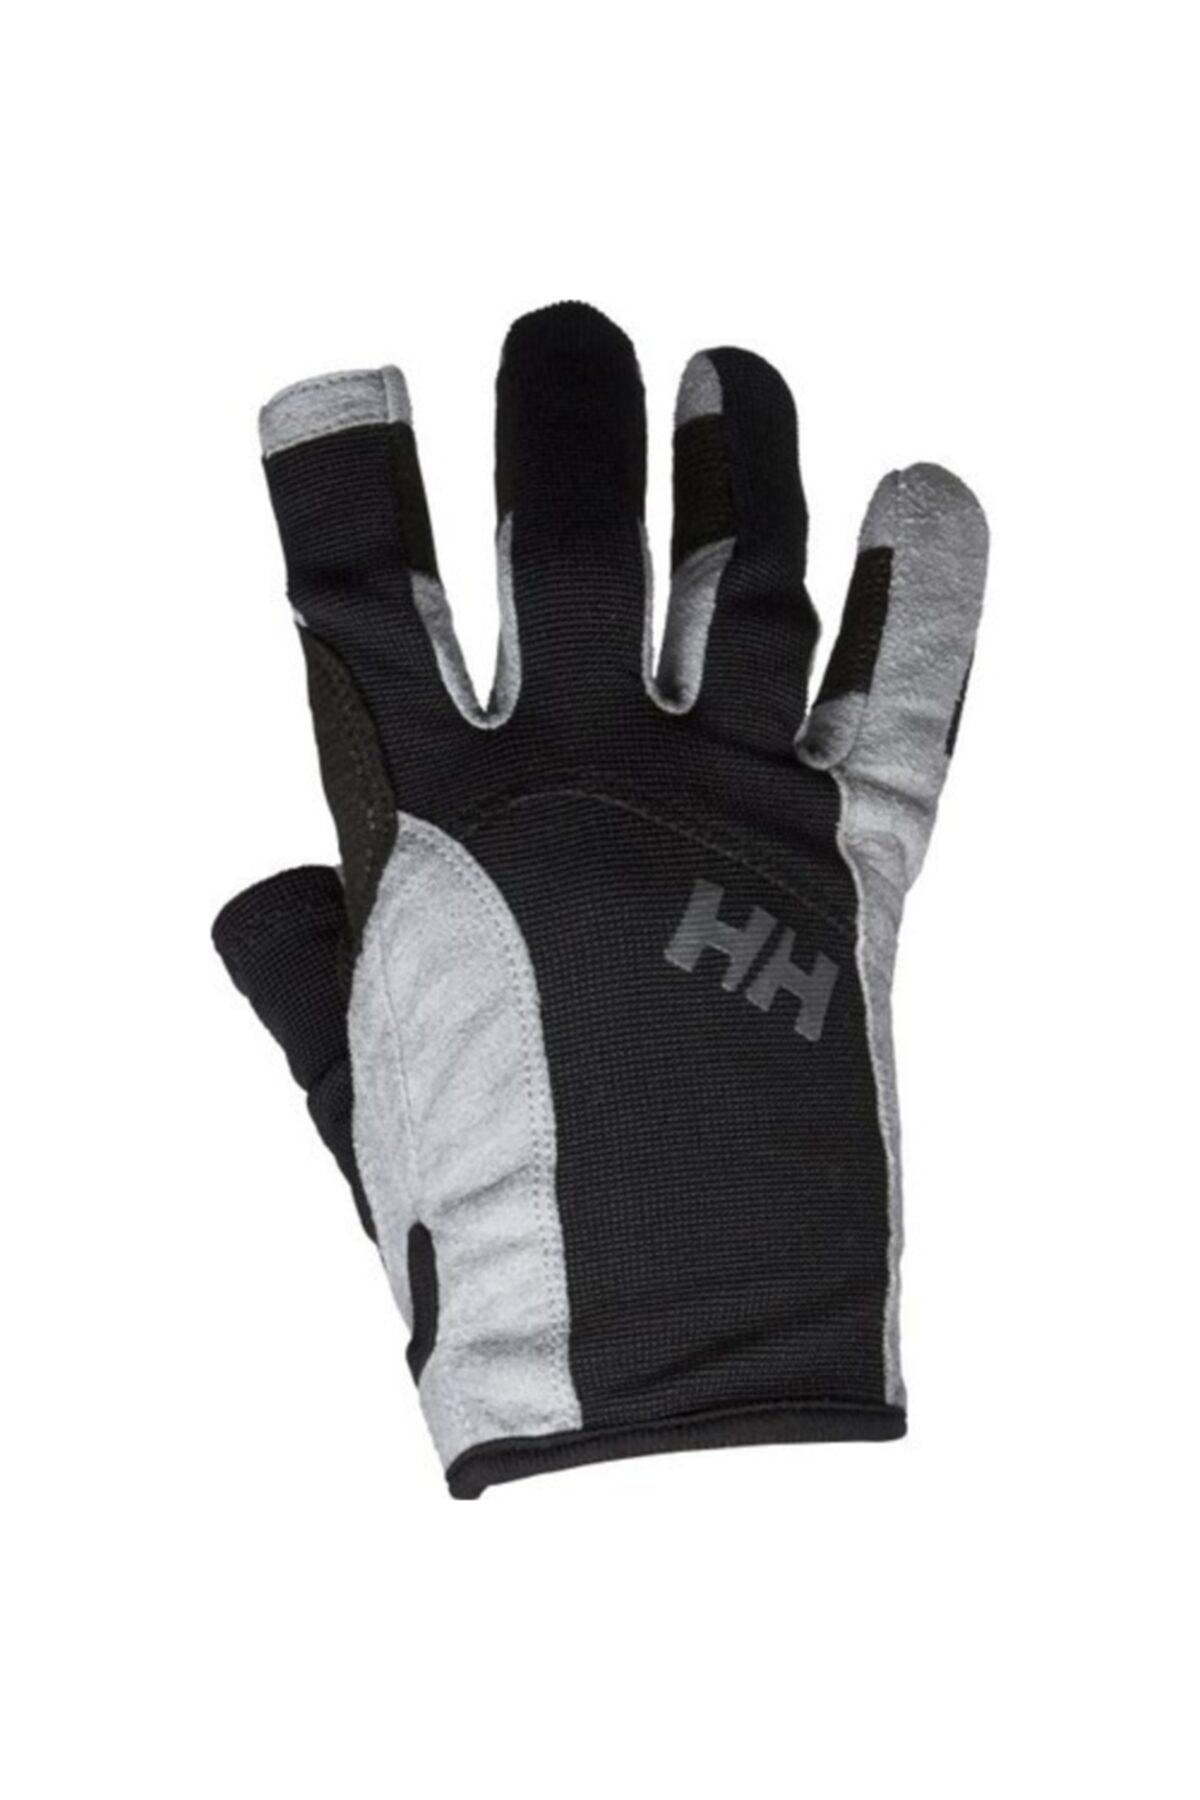 Helly Hansen Sailing Glove Long Uzun Yelken Eldiveni 1